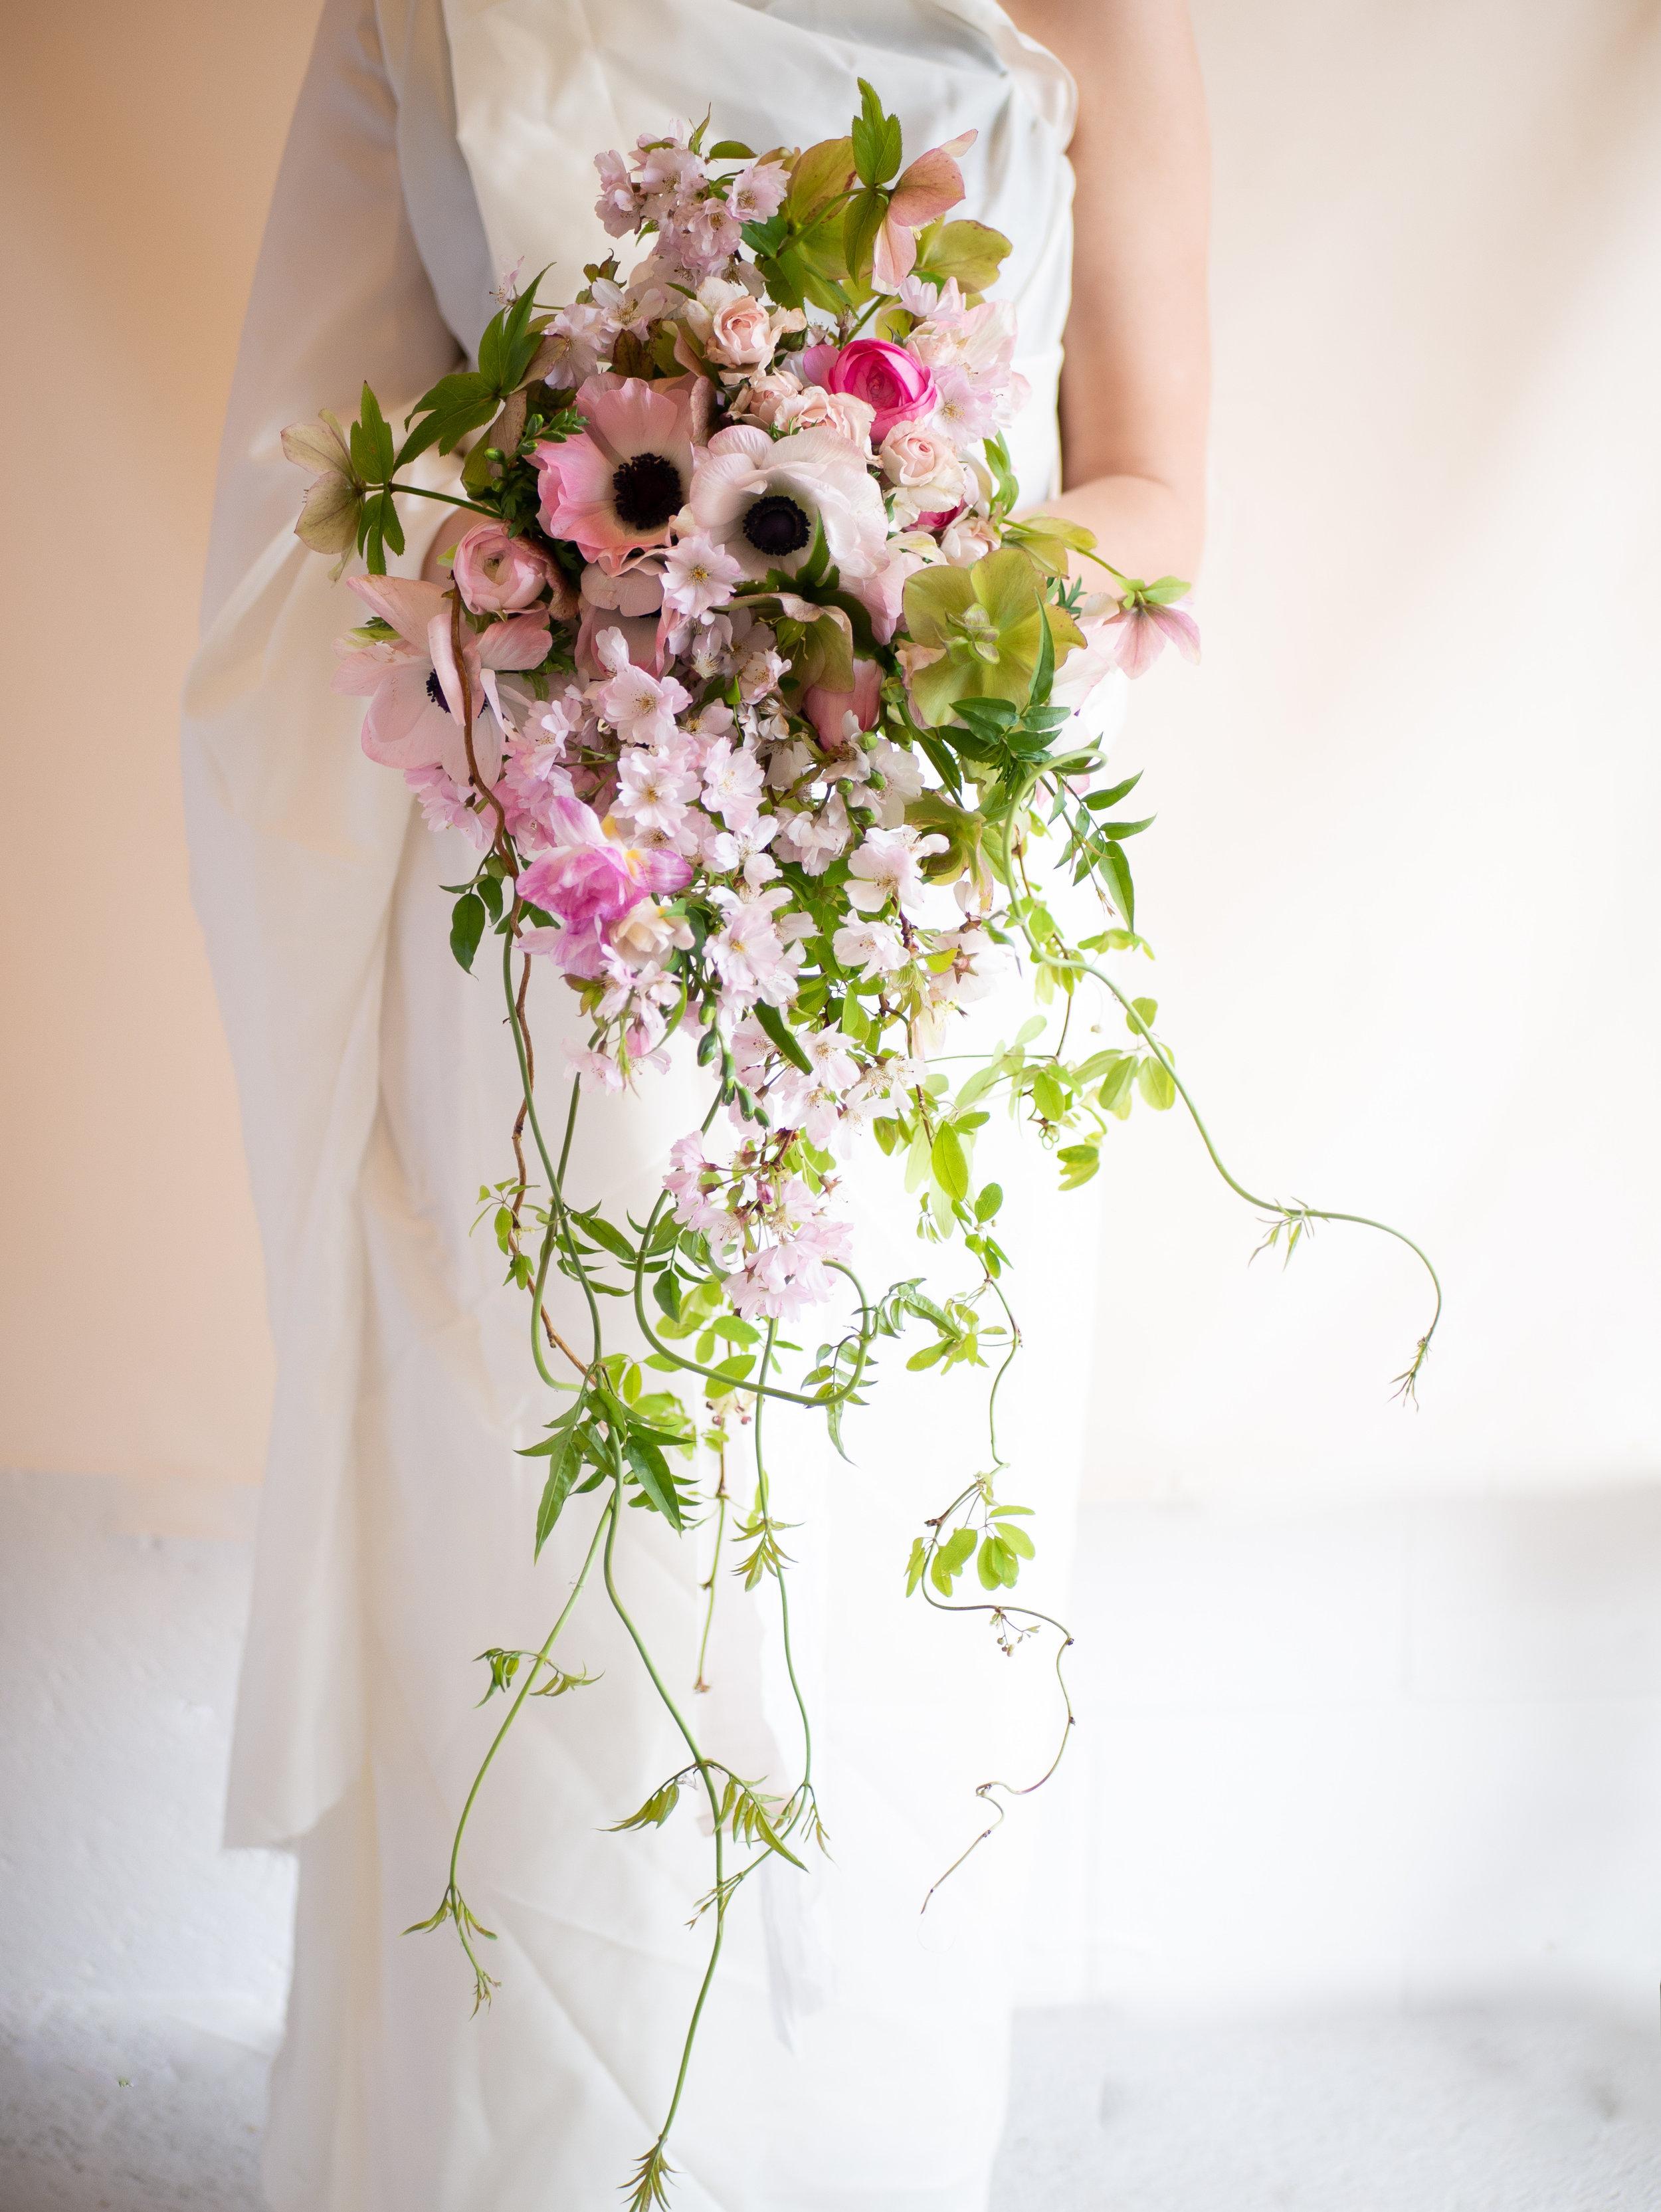 Wild Wedding Flowers Blog Balsham House Flowers